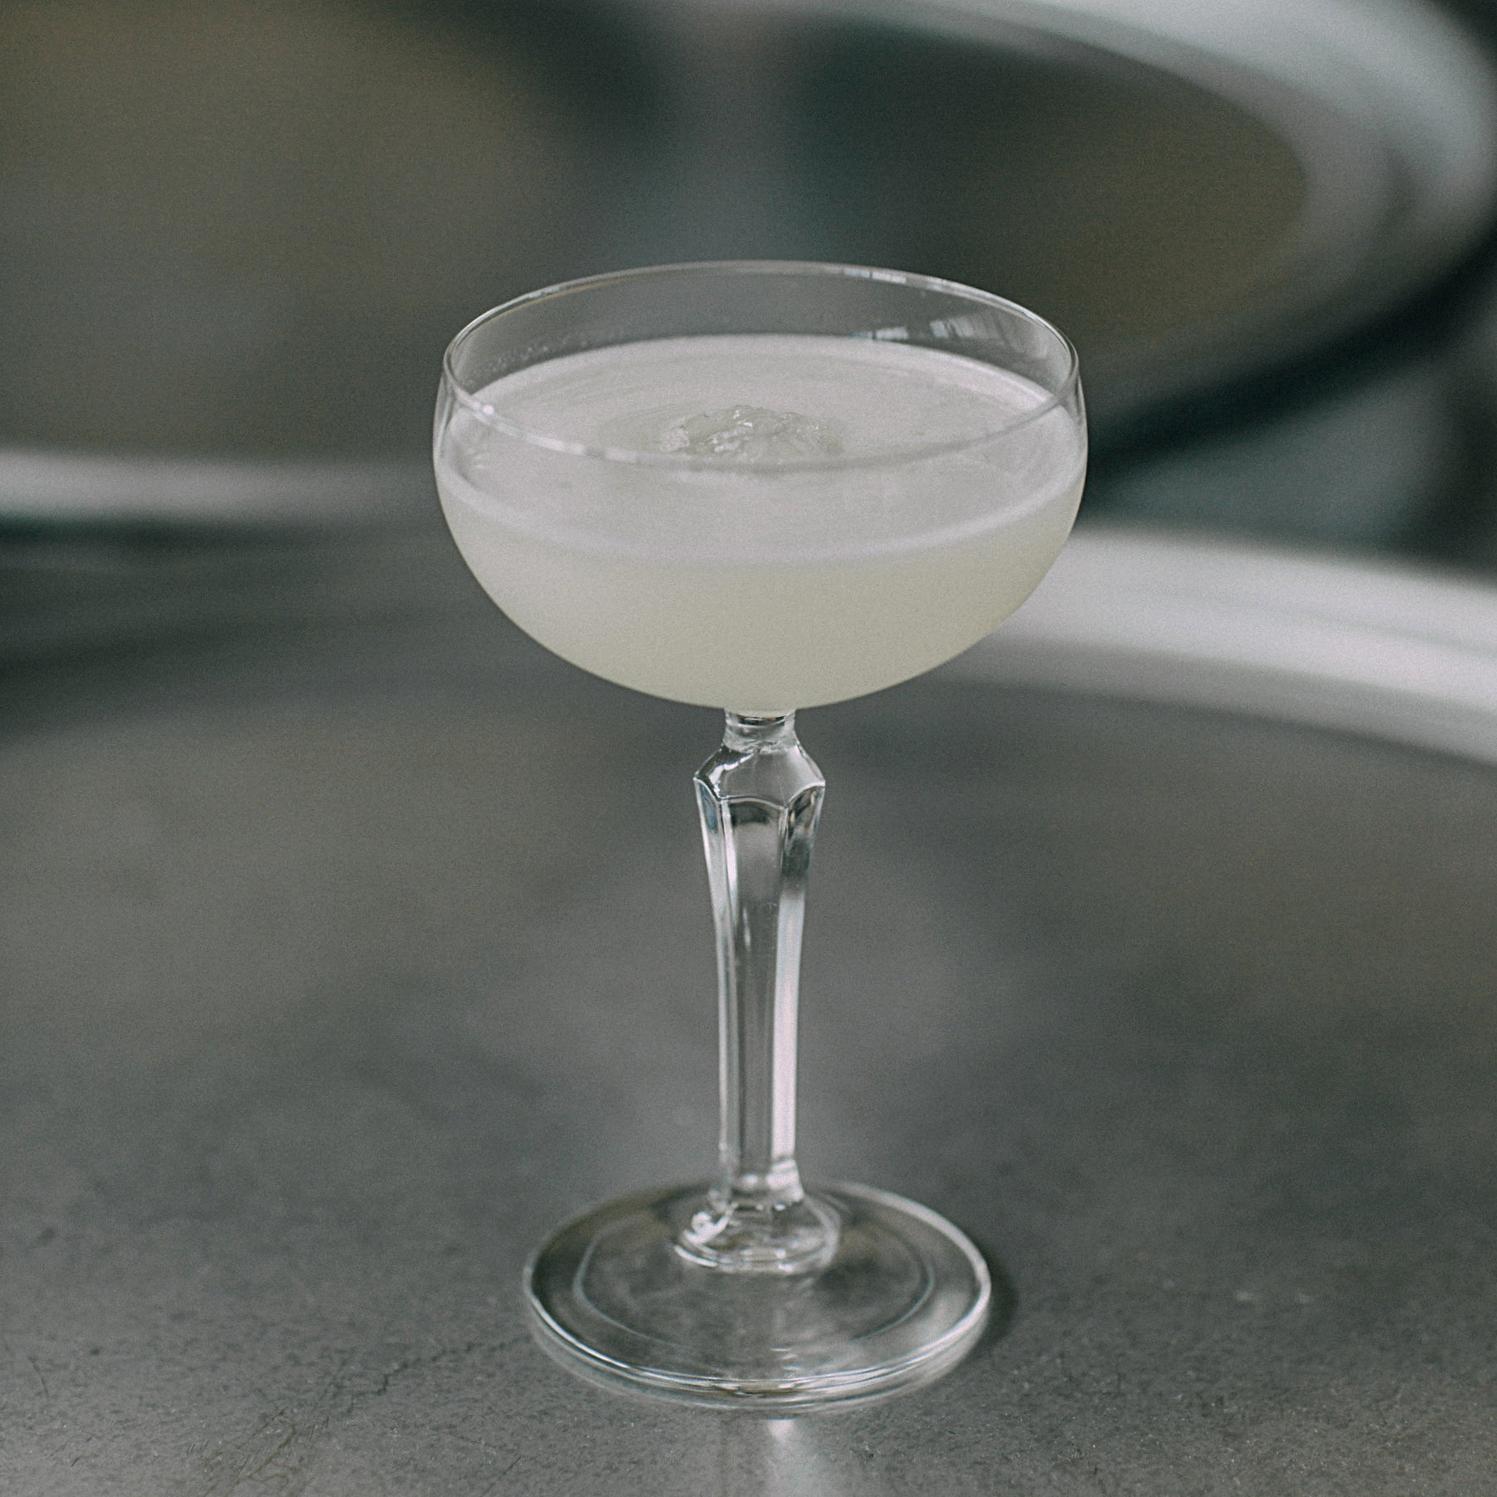 Norseman Gin Gimlet